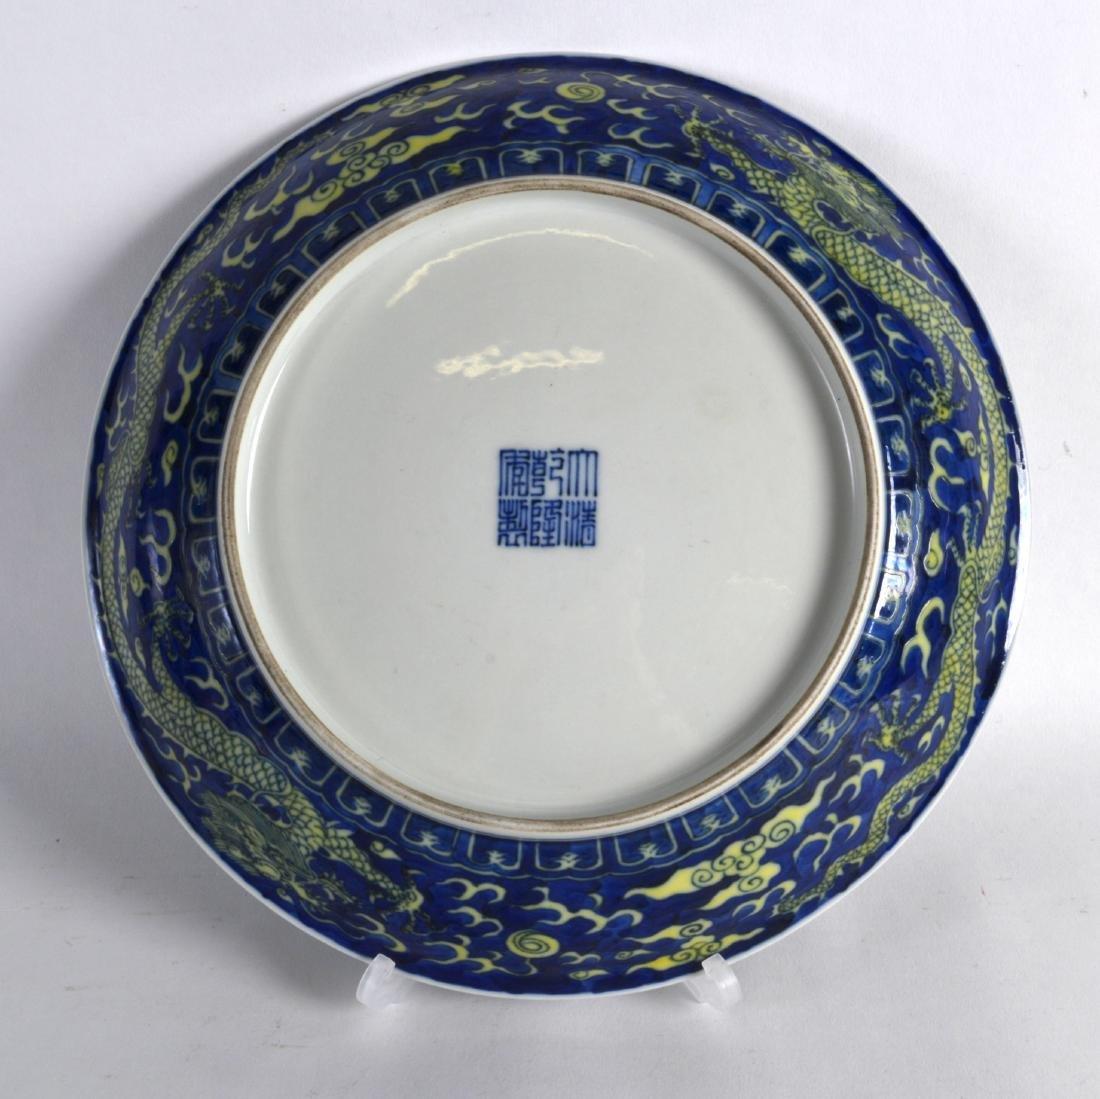 A CHINESE YELLOW AND BLUE GROUND CIRCULAR DISH bearing - 2